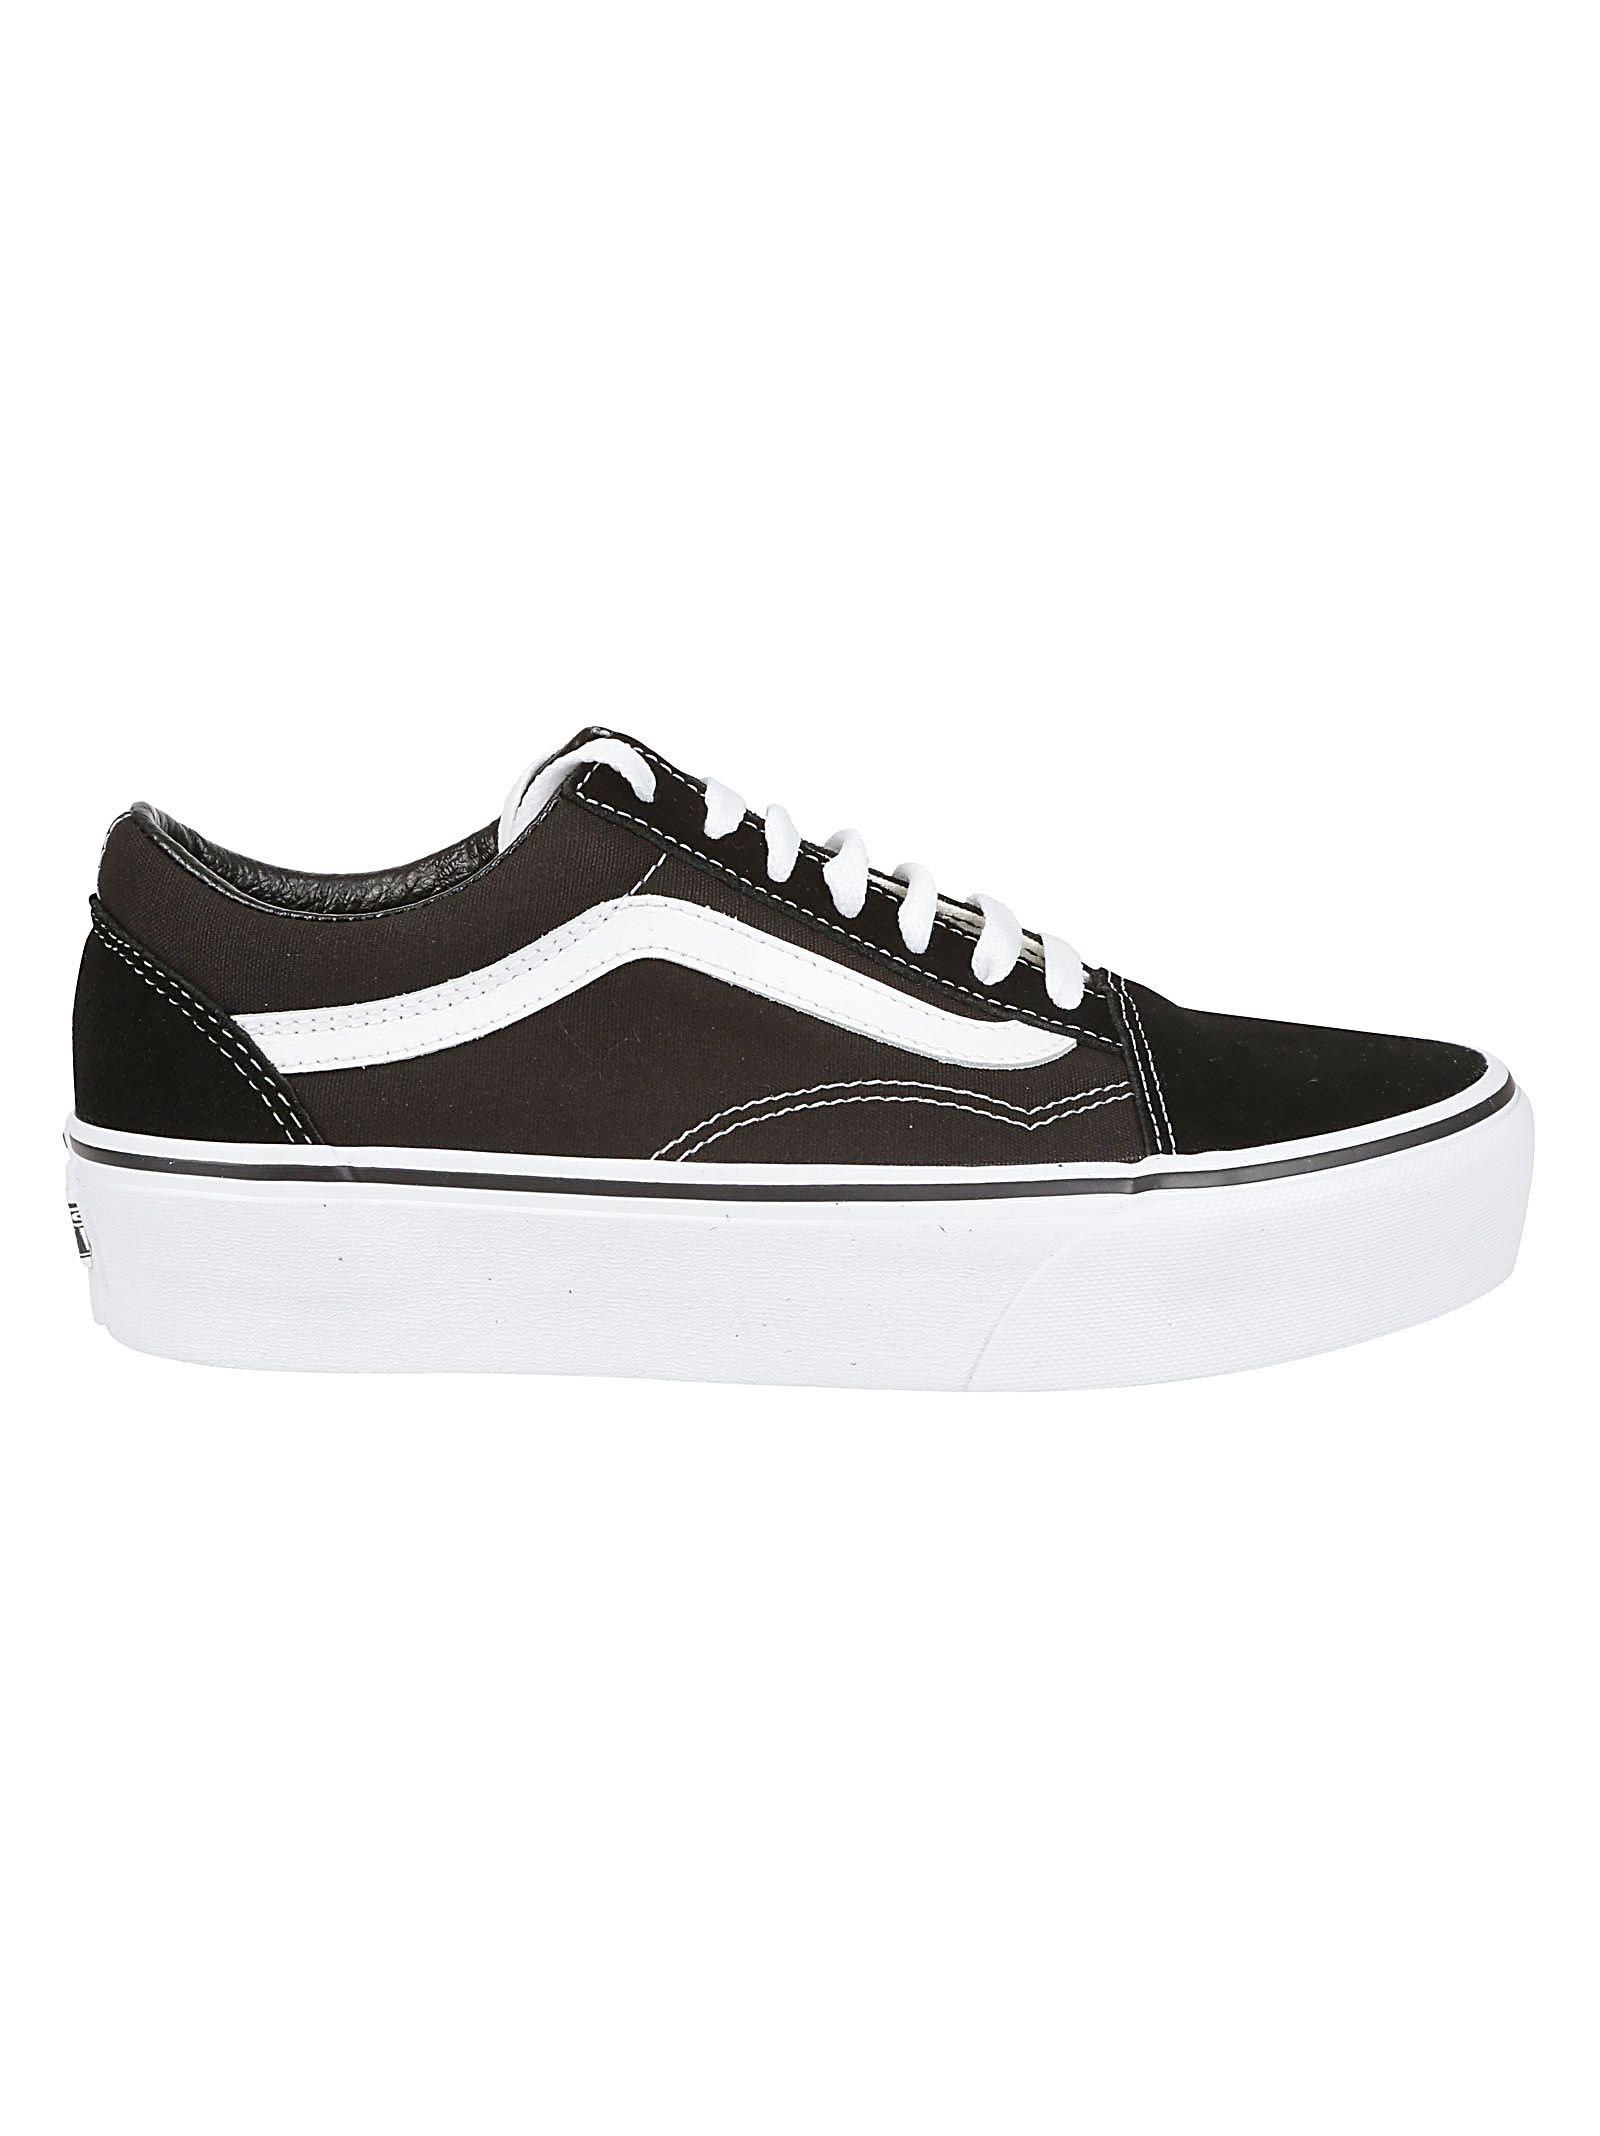 Vans Old School Sneakers